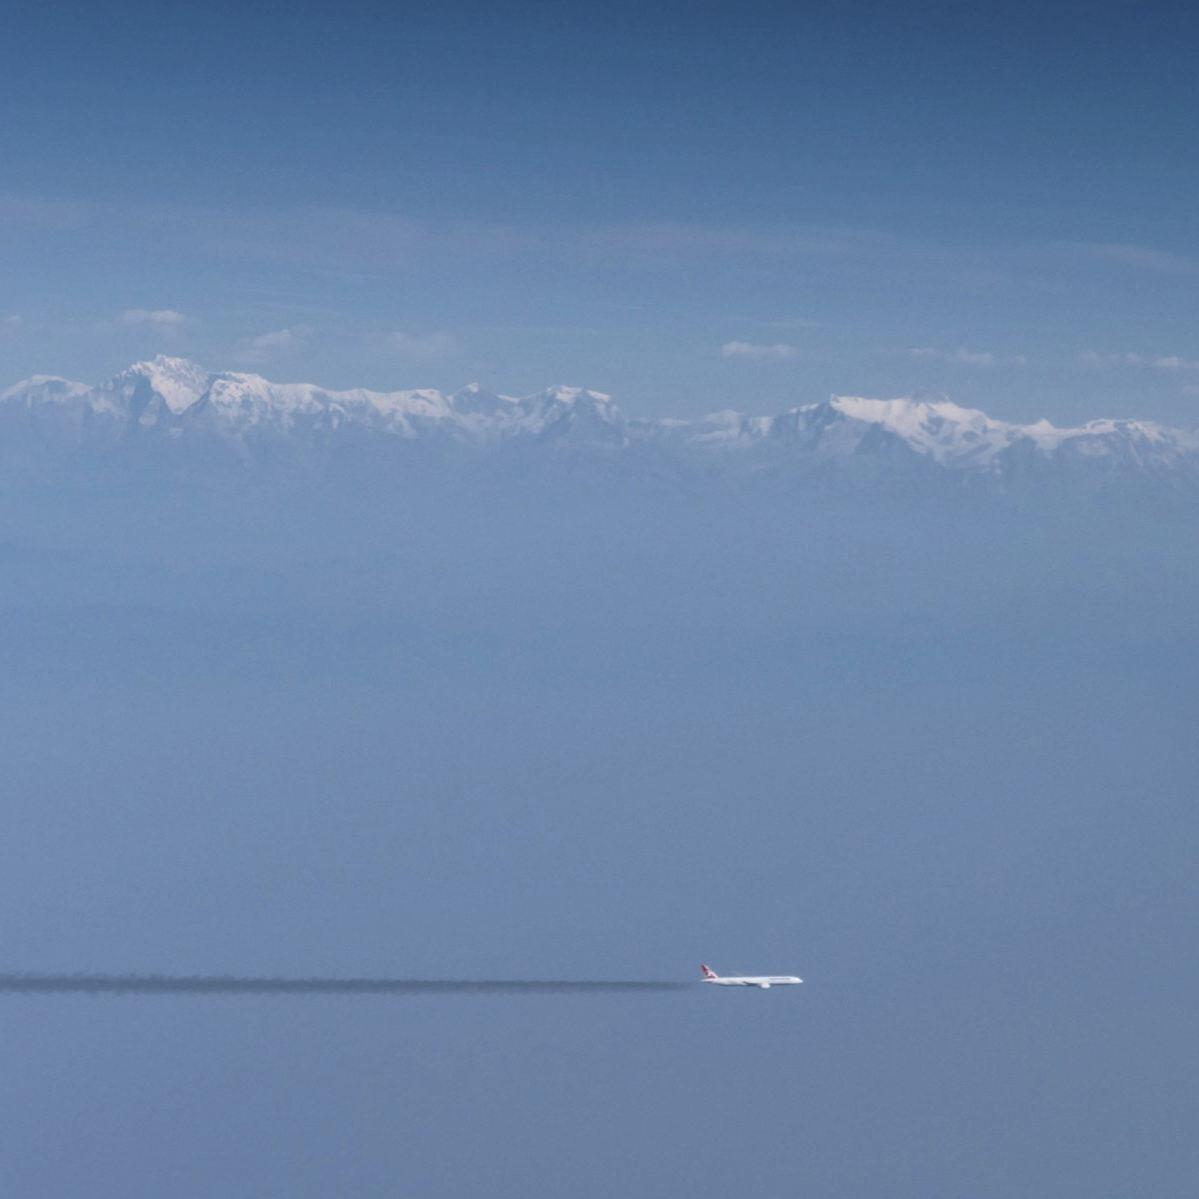 An airplane flies in front of the Himalaya range. Noah Strycker